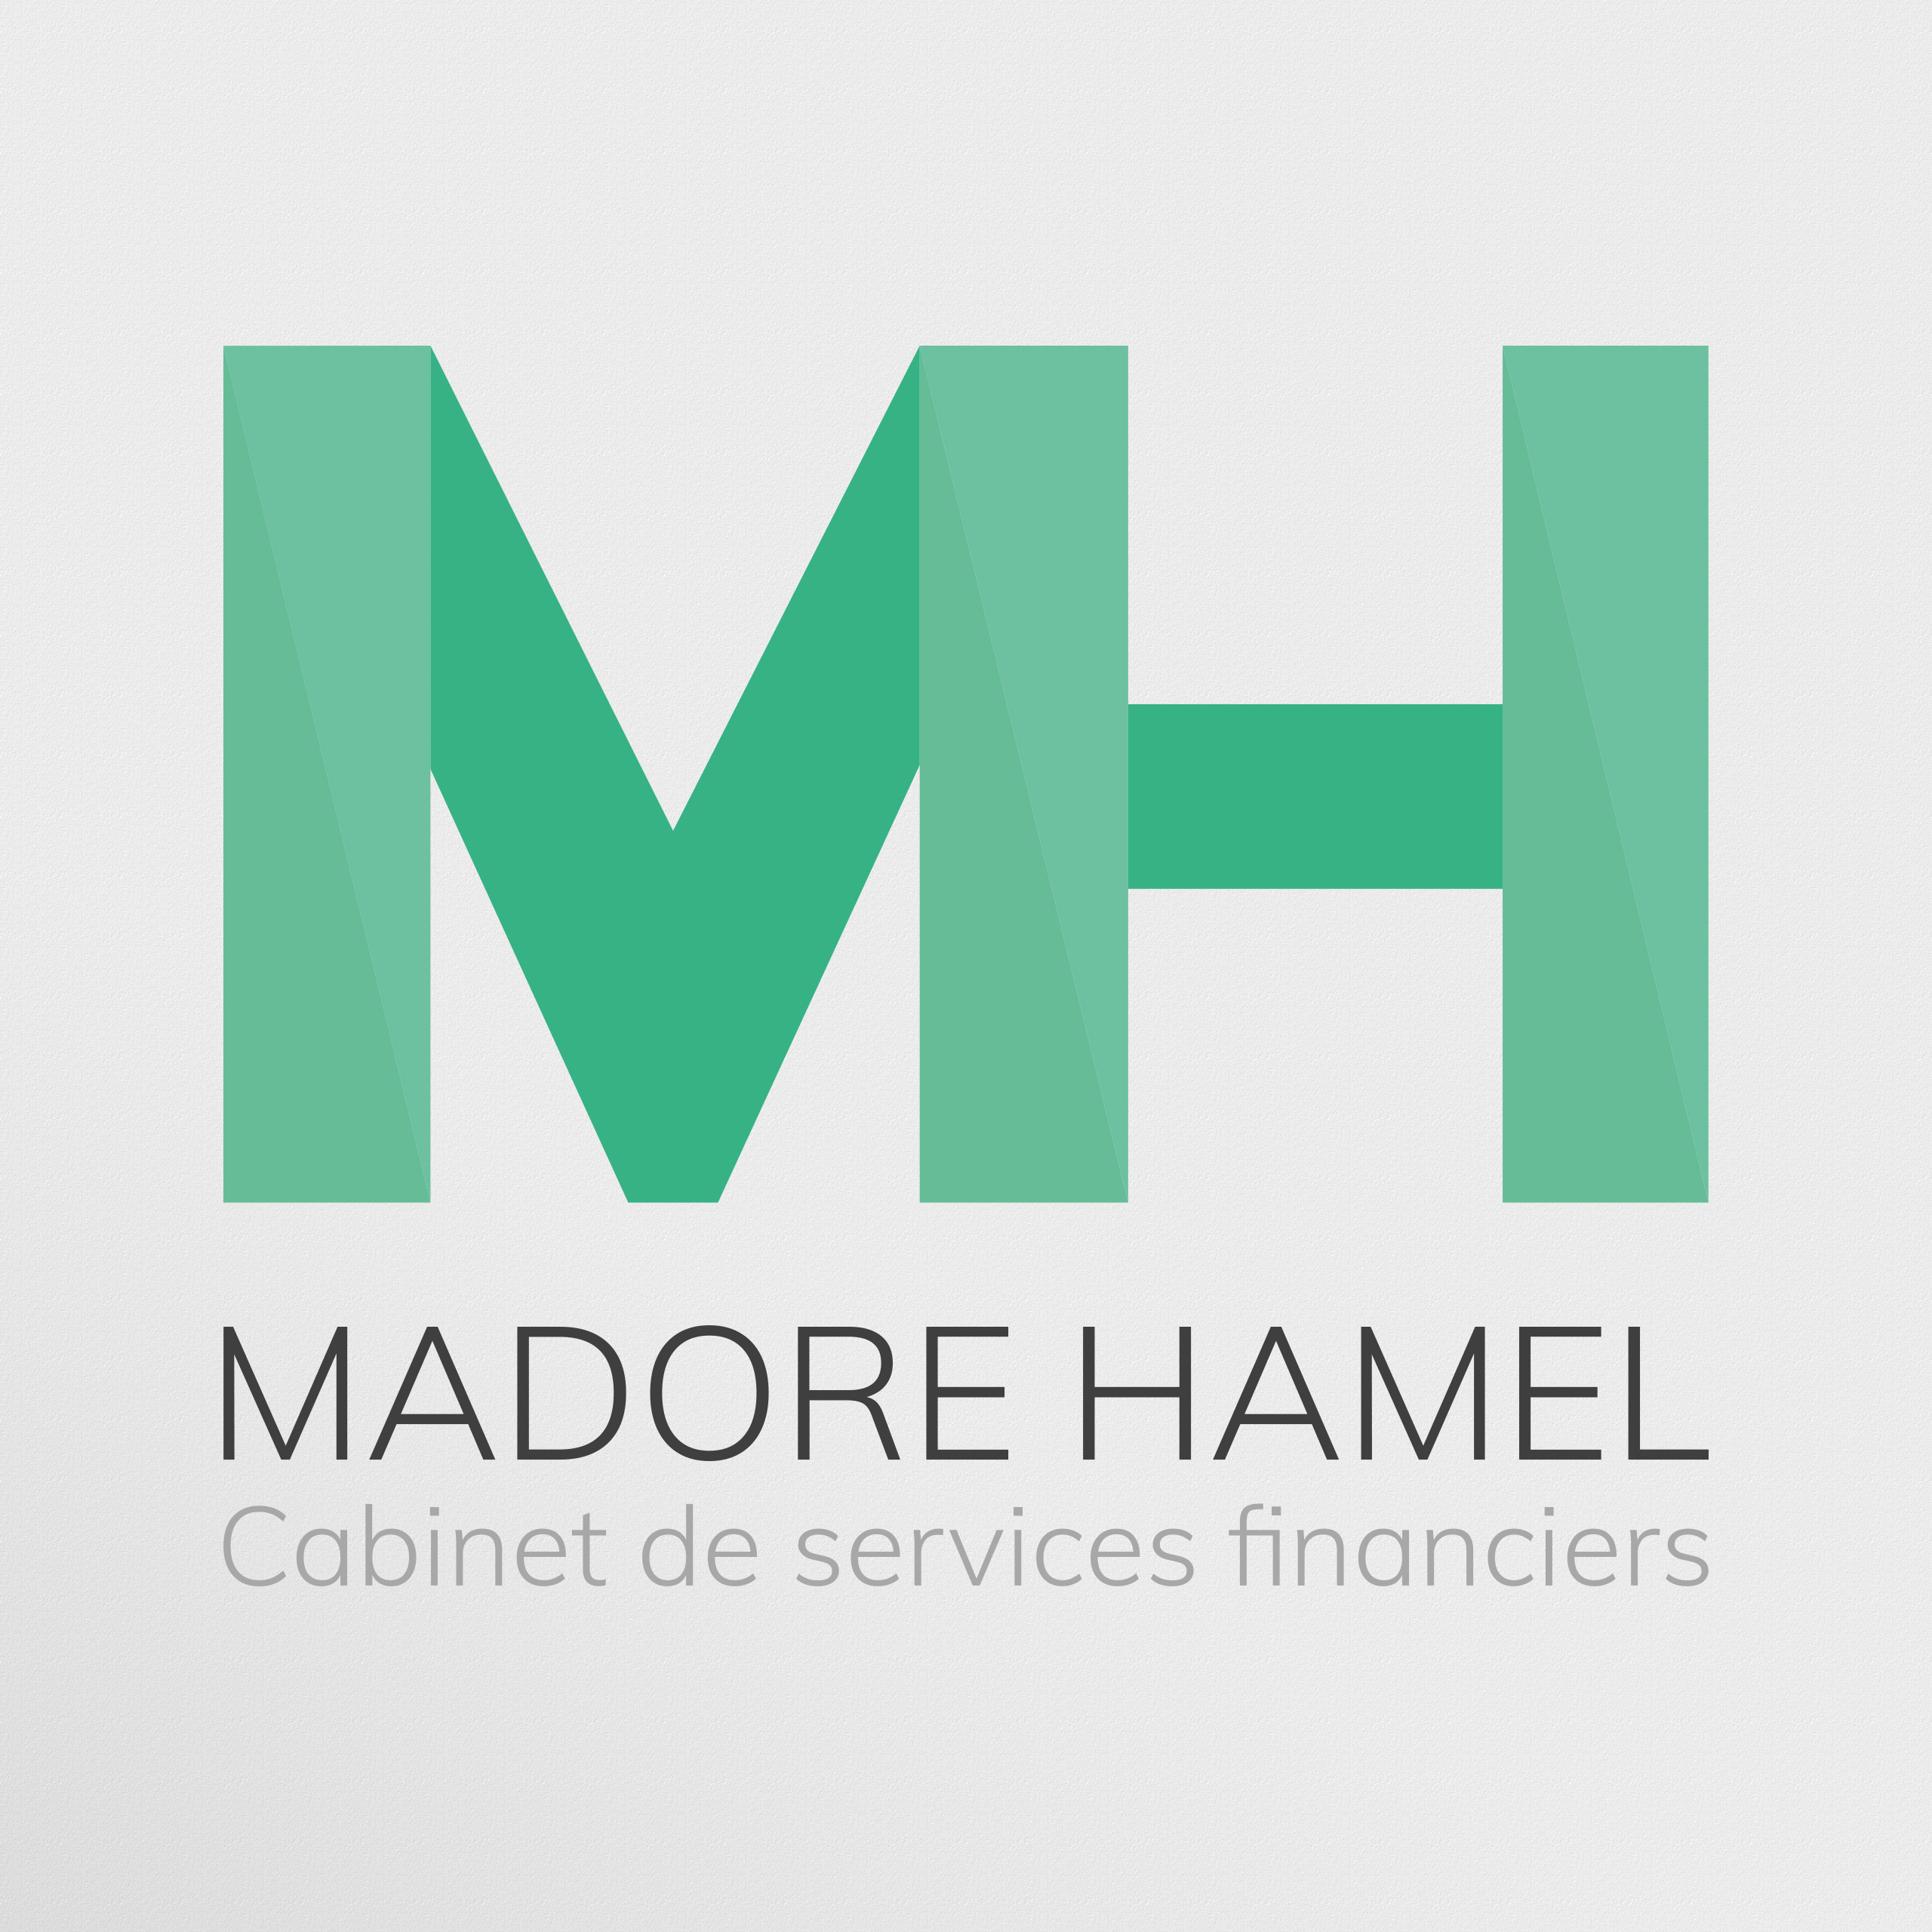 Madore Hamel - Cabinet de services financiers